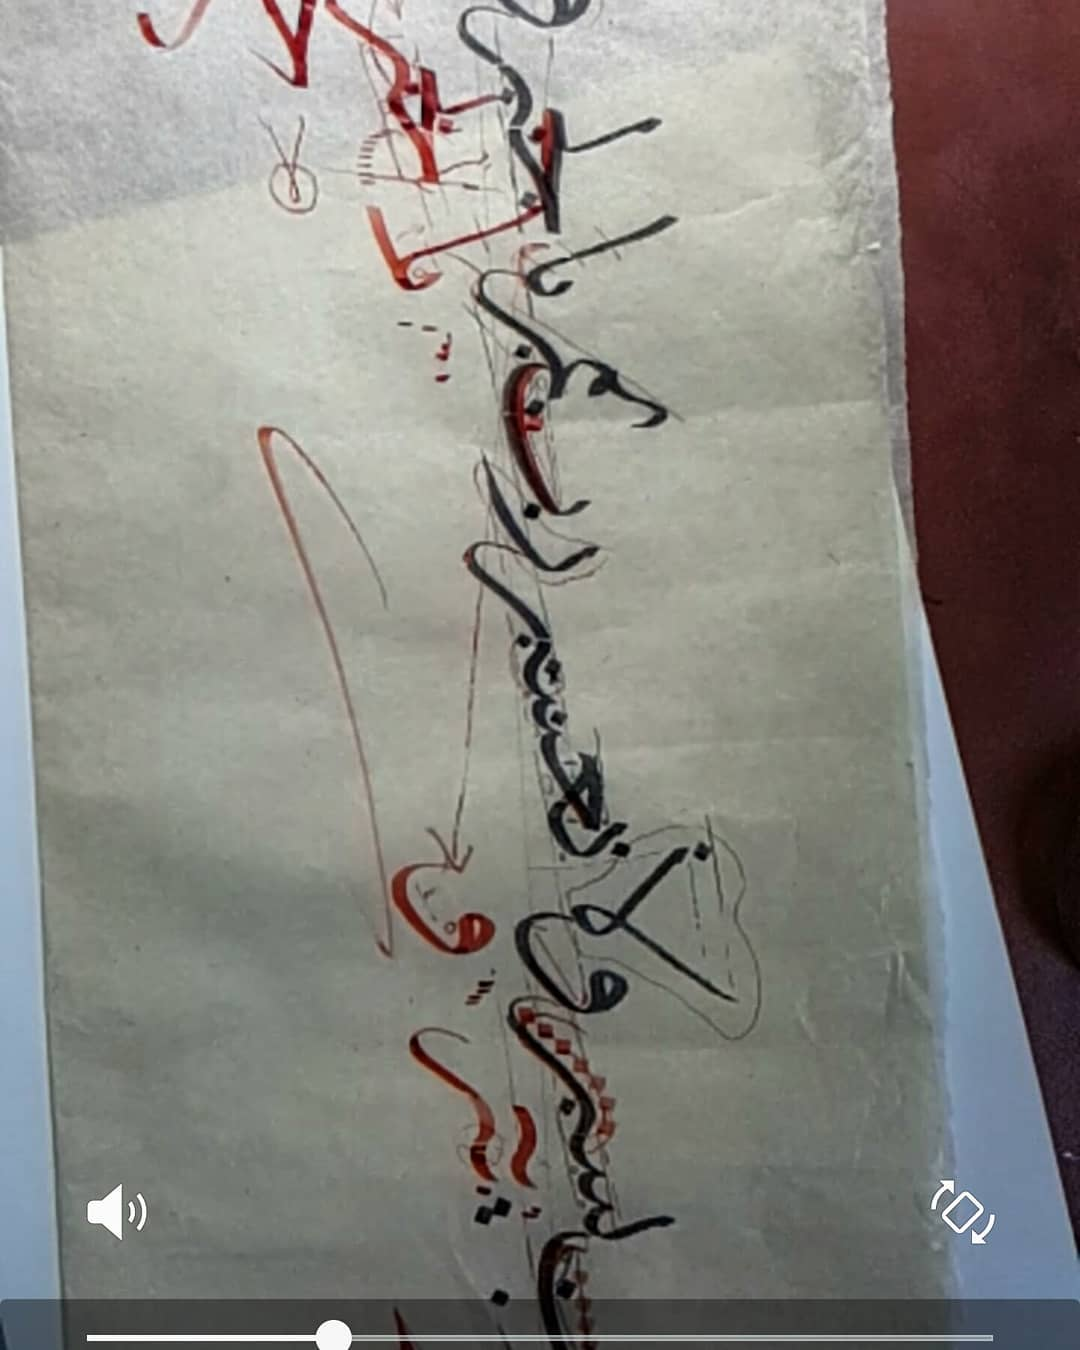 Works Calligraphy Haythamsalmo كتابة الشاب ابراهيم شاهير منذ شهرين بثت على انستغرام… 124